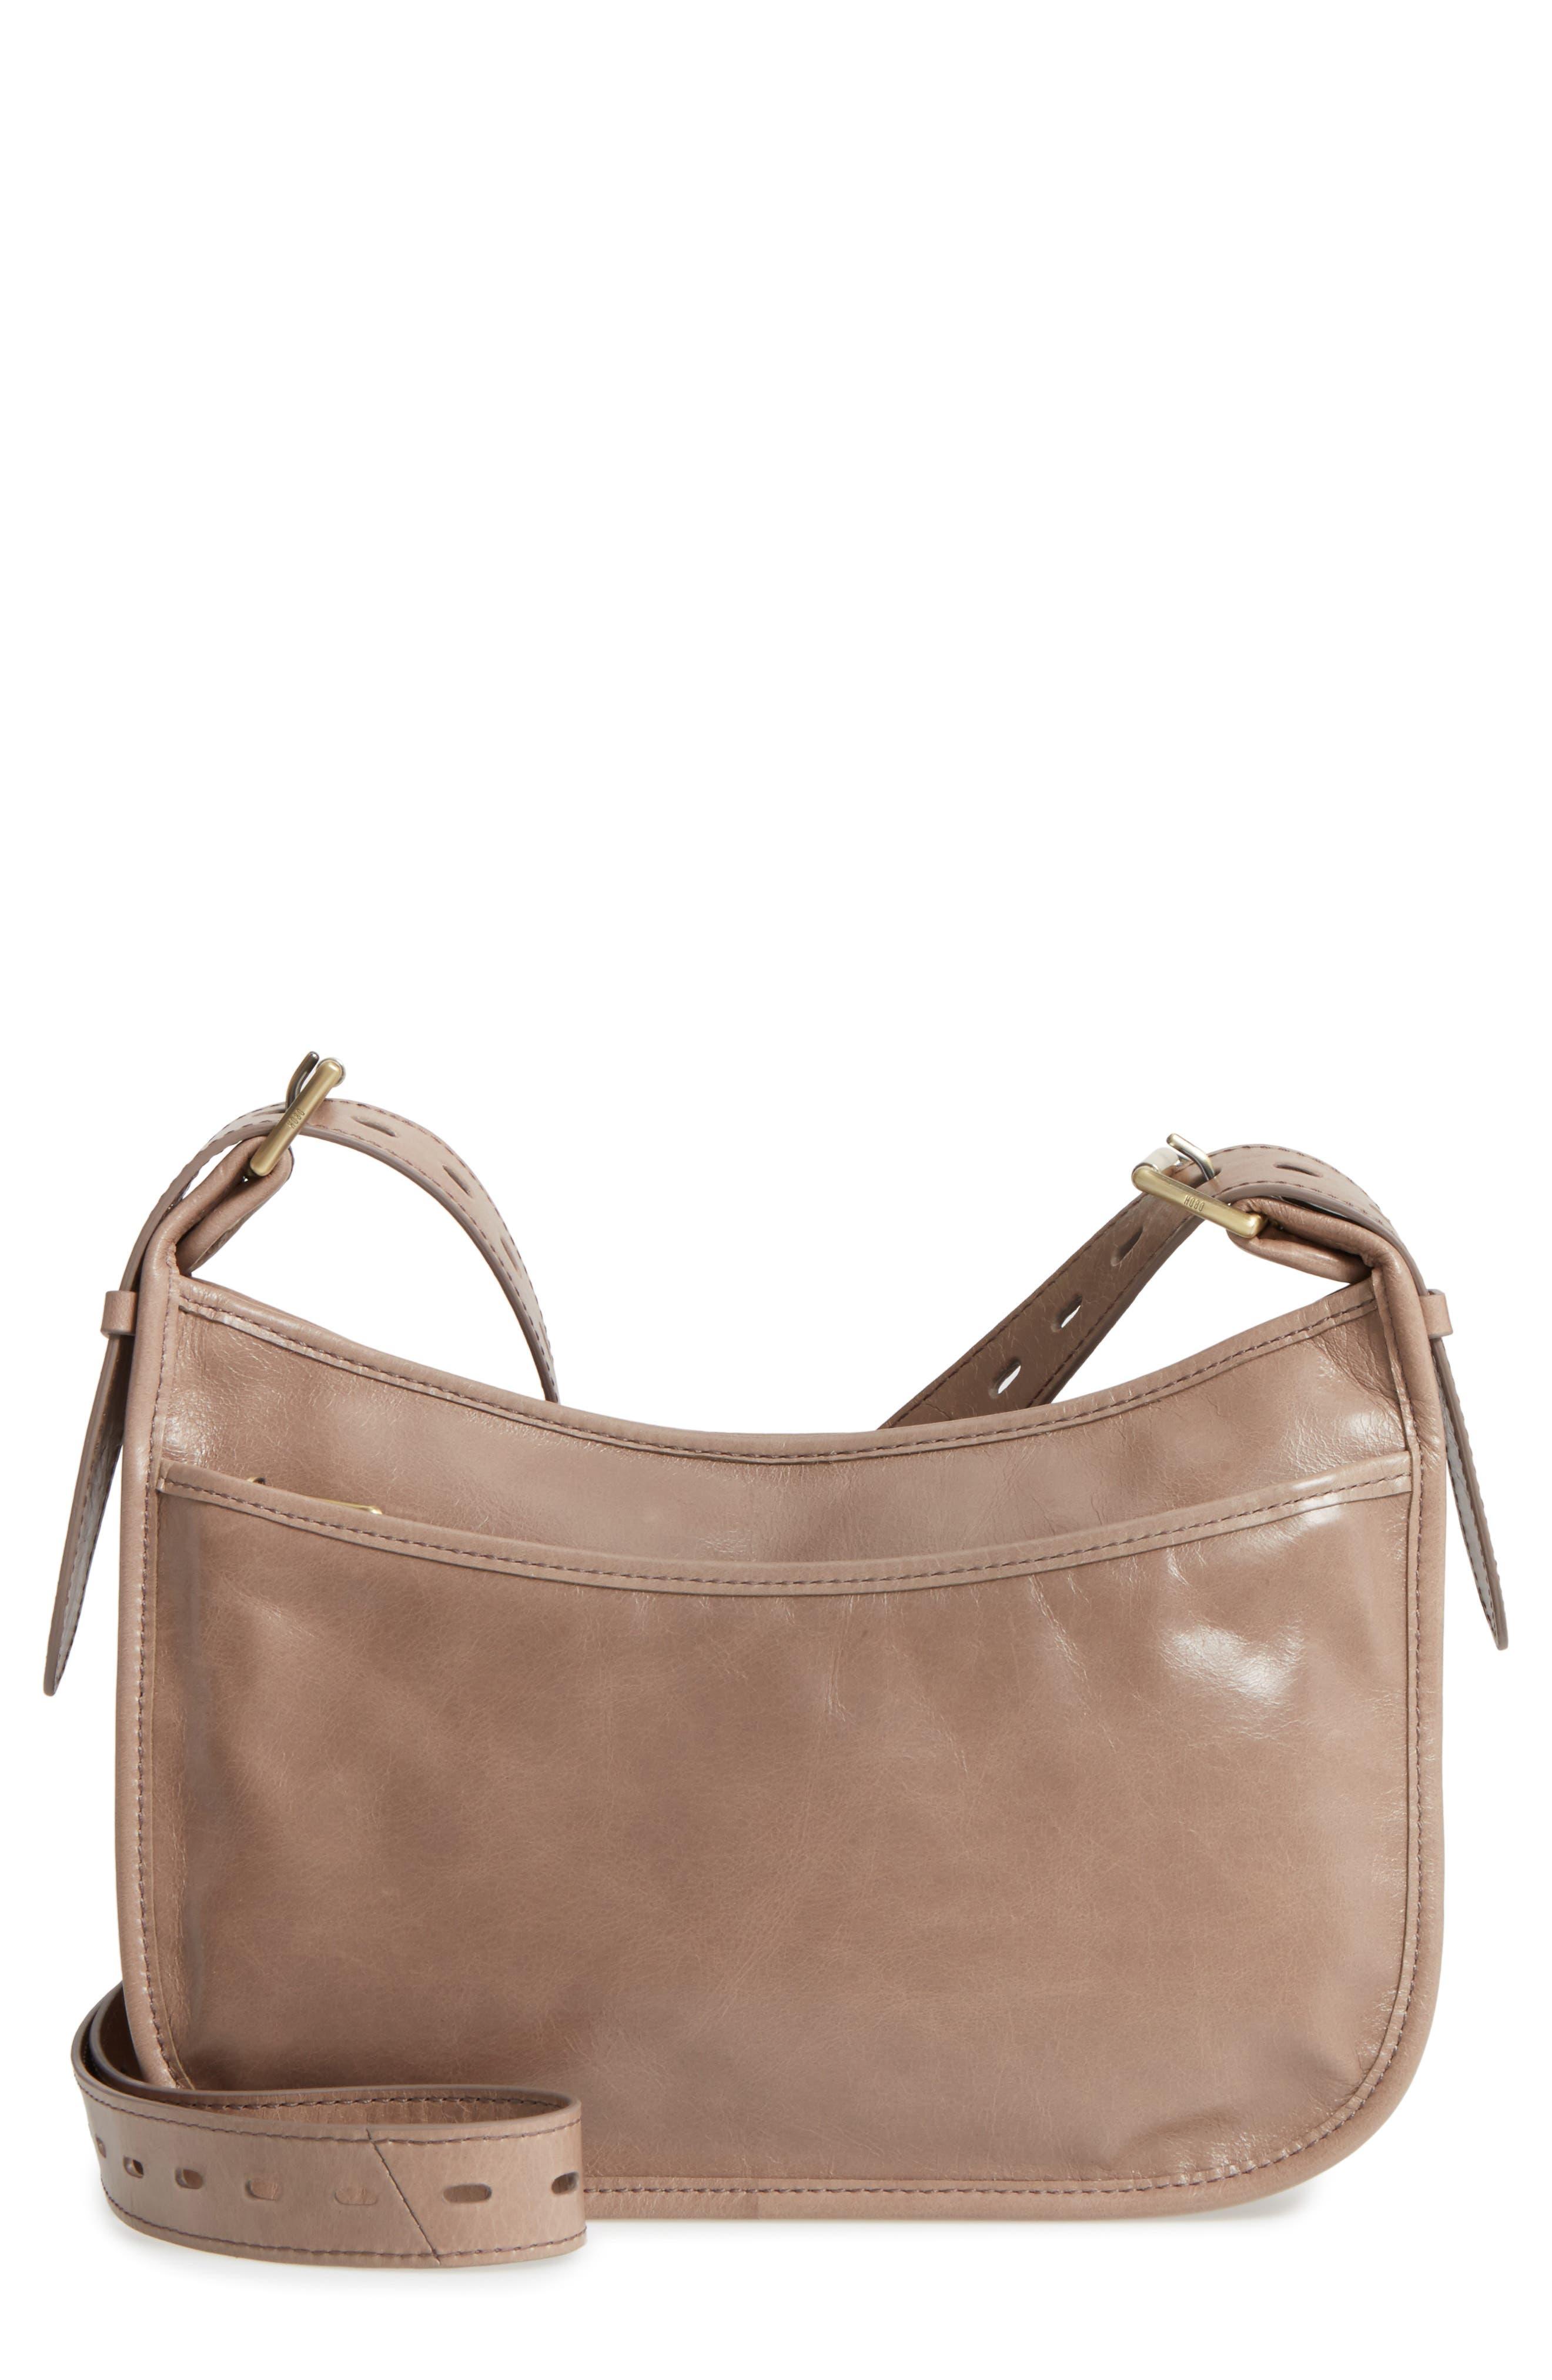 Main Image - Hobo Chase Calfskin Leather Crossbody Bag